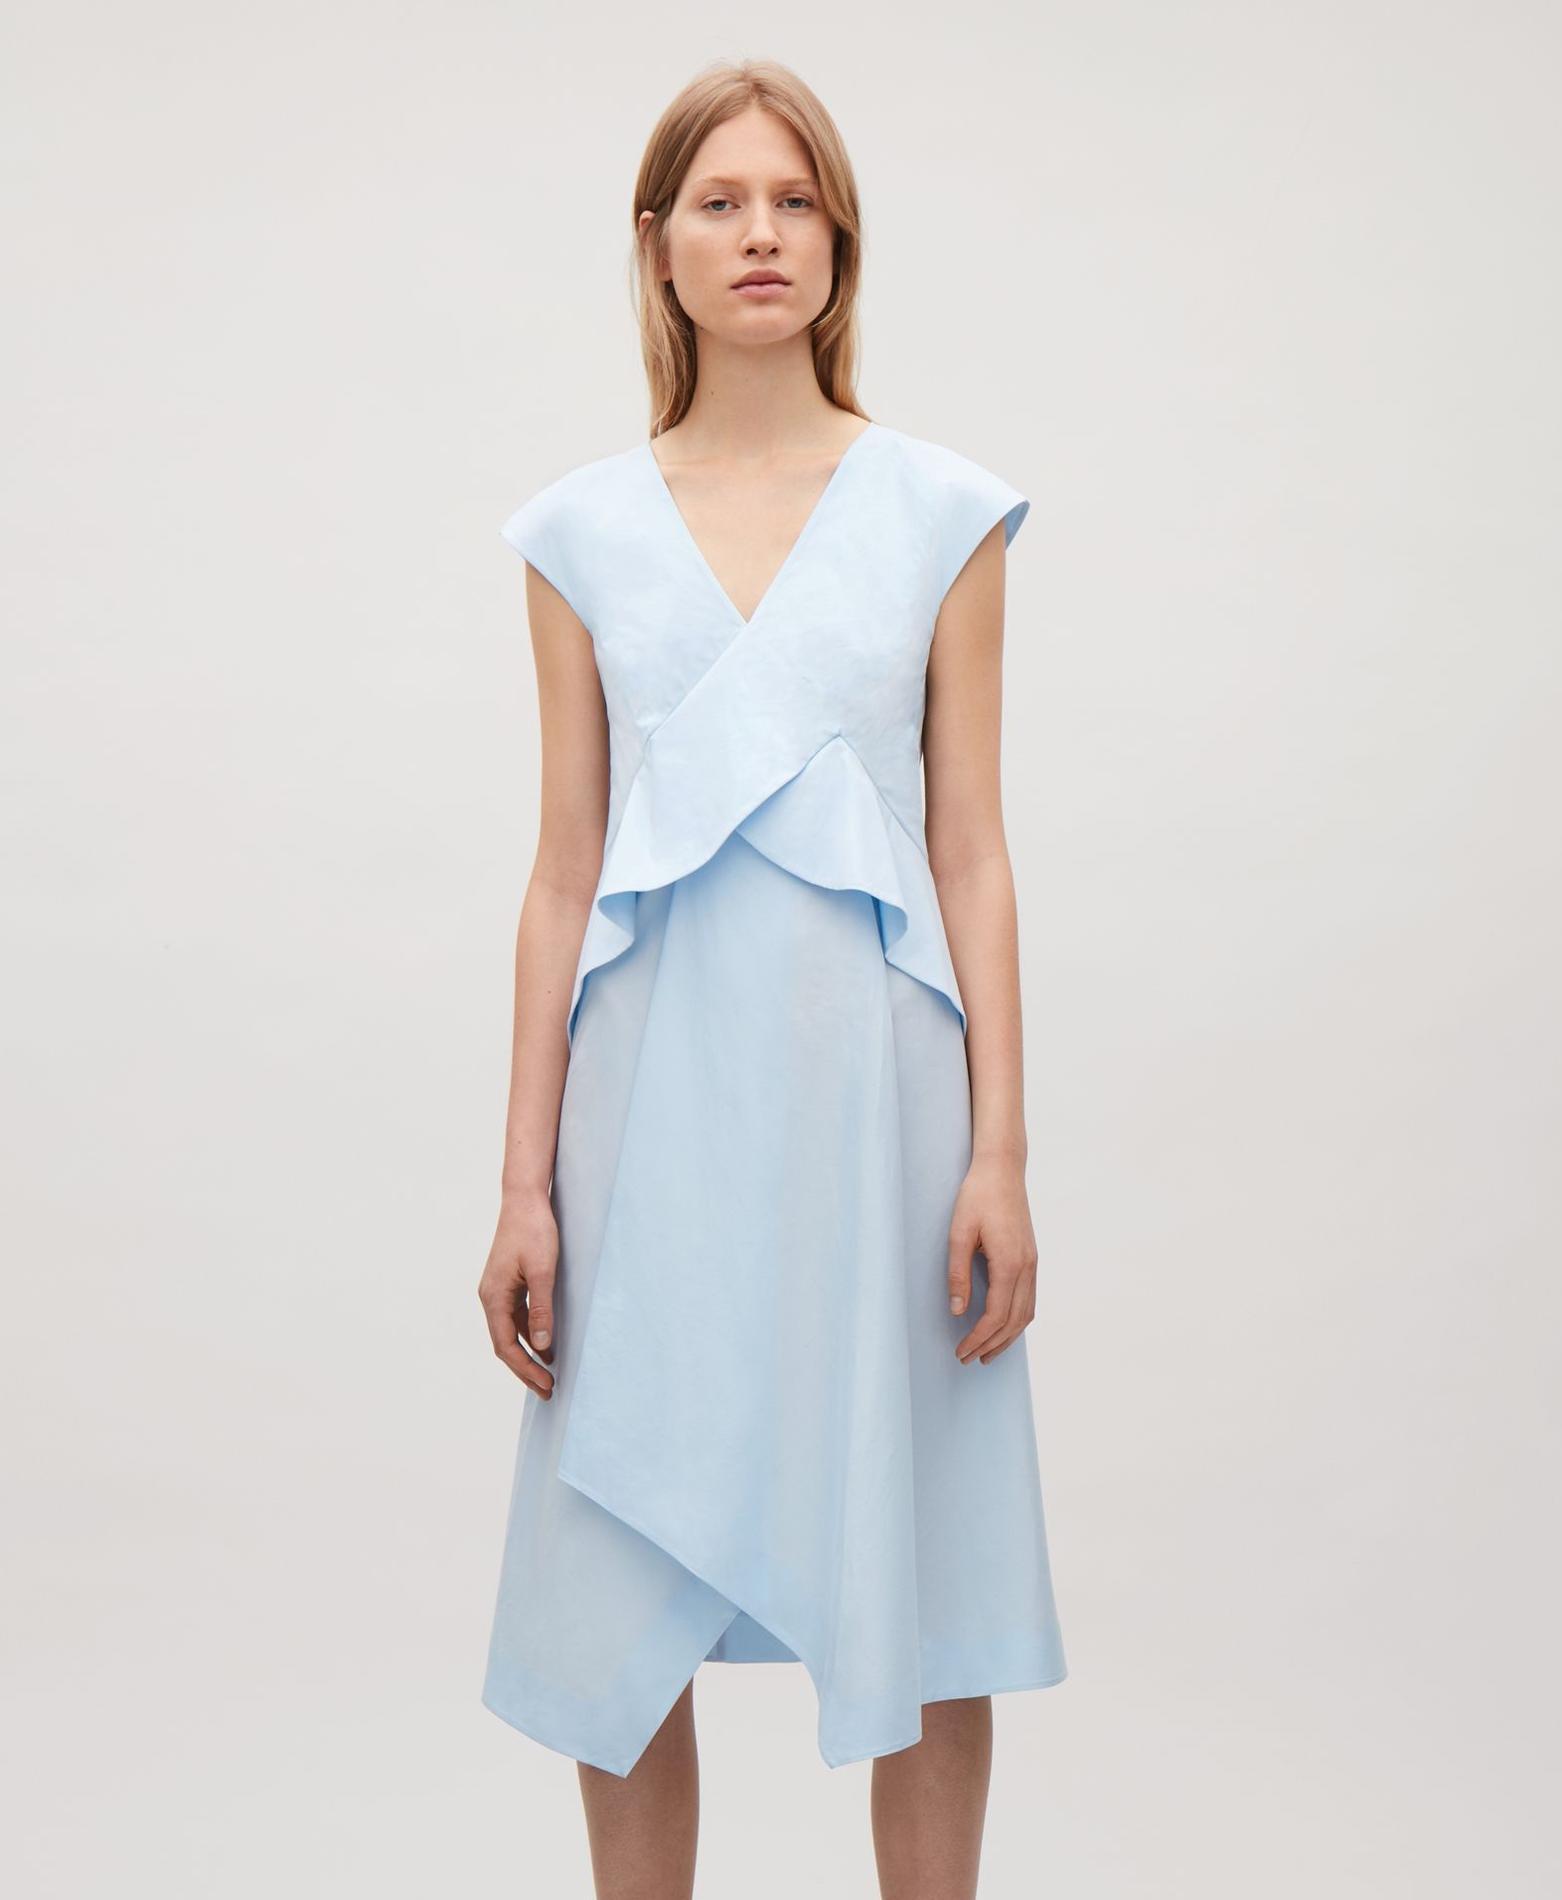 robe de mariage pour bebe fille fashion designs. Black Bedroom Furniture Sets. Home Design Ideas